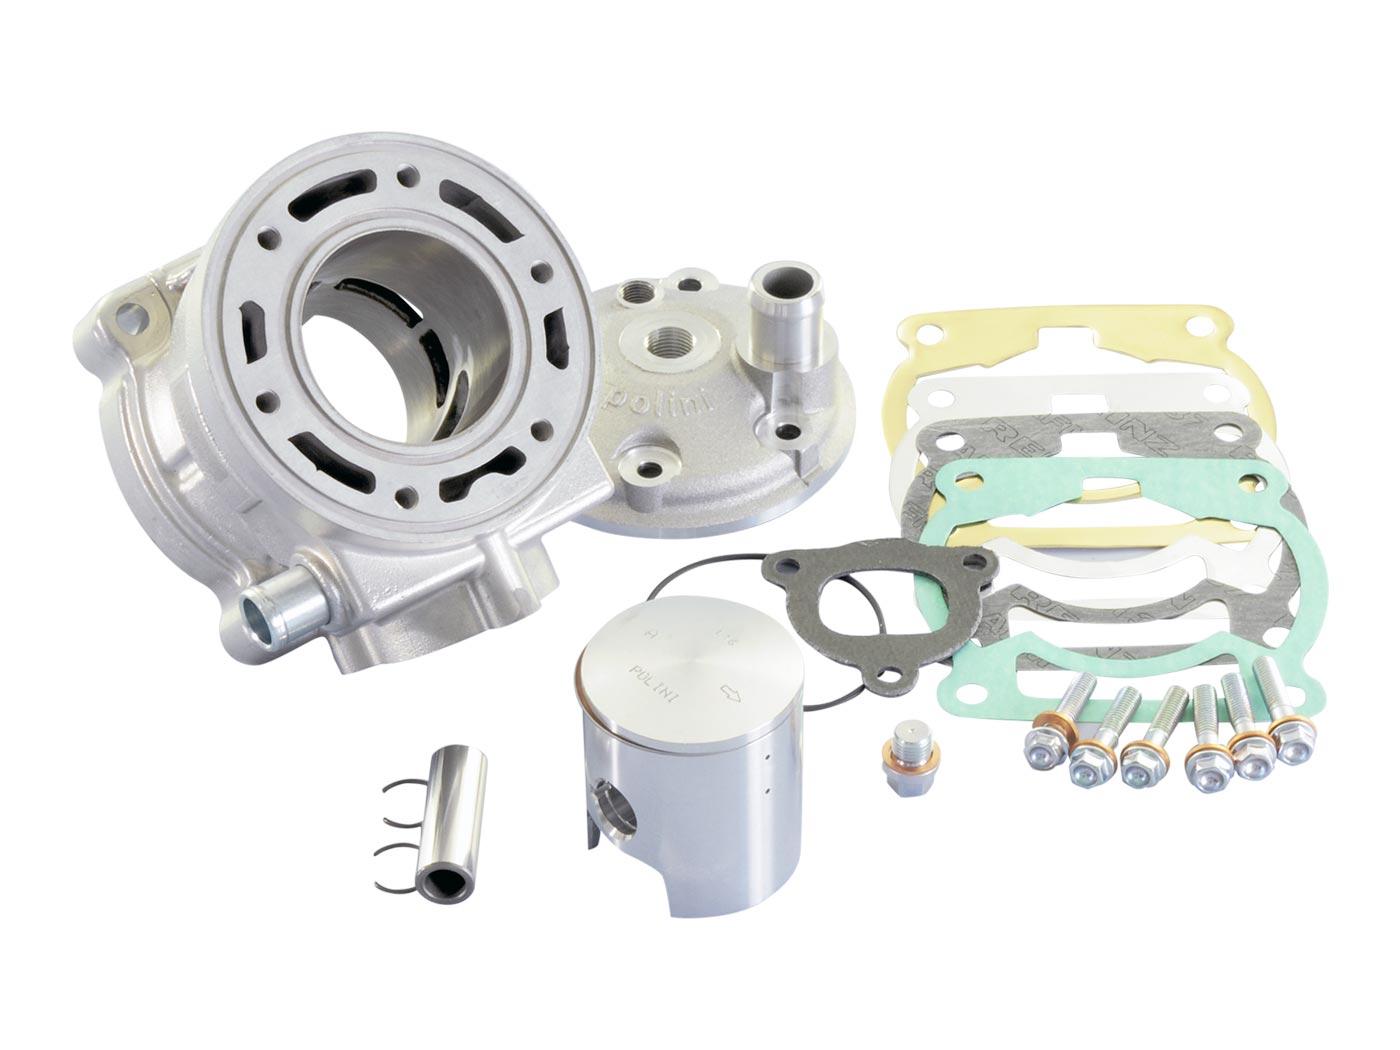 Kurbelwelle SET Naraku Fantic Motor Regolarita Casa Generic-Trigger SM X  AM6 50